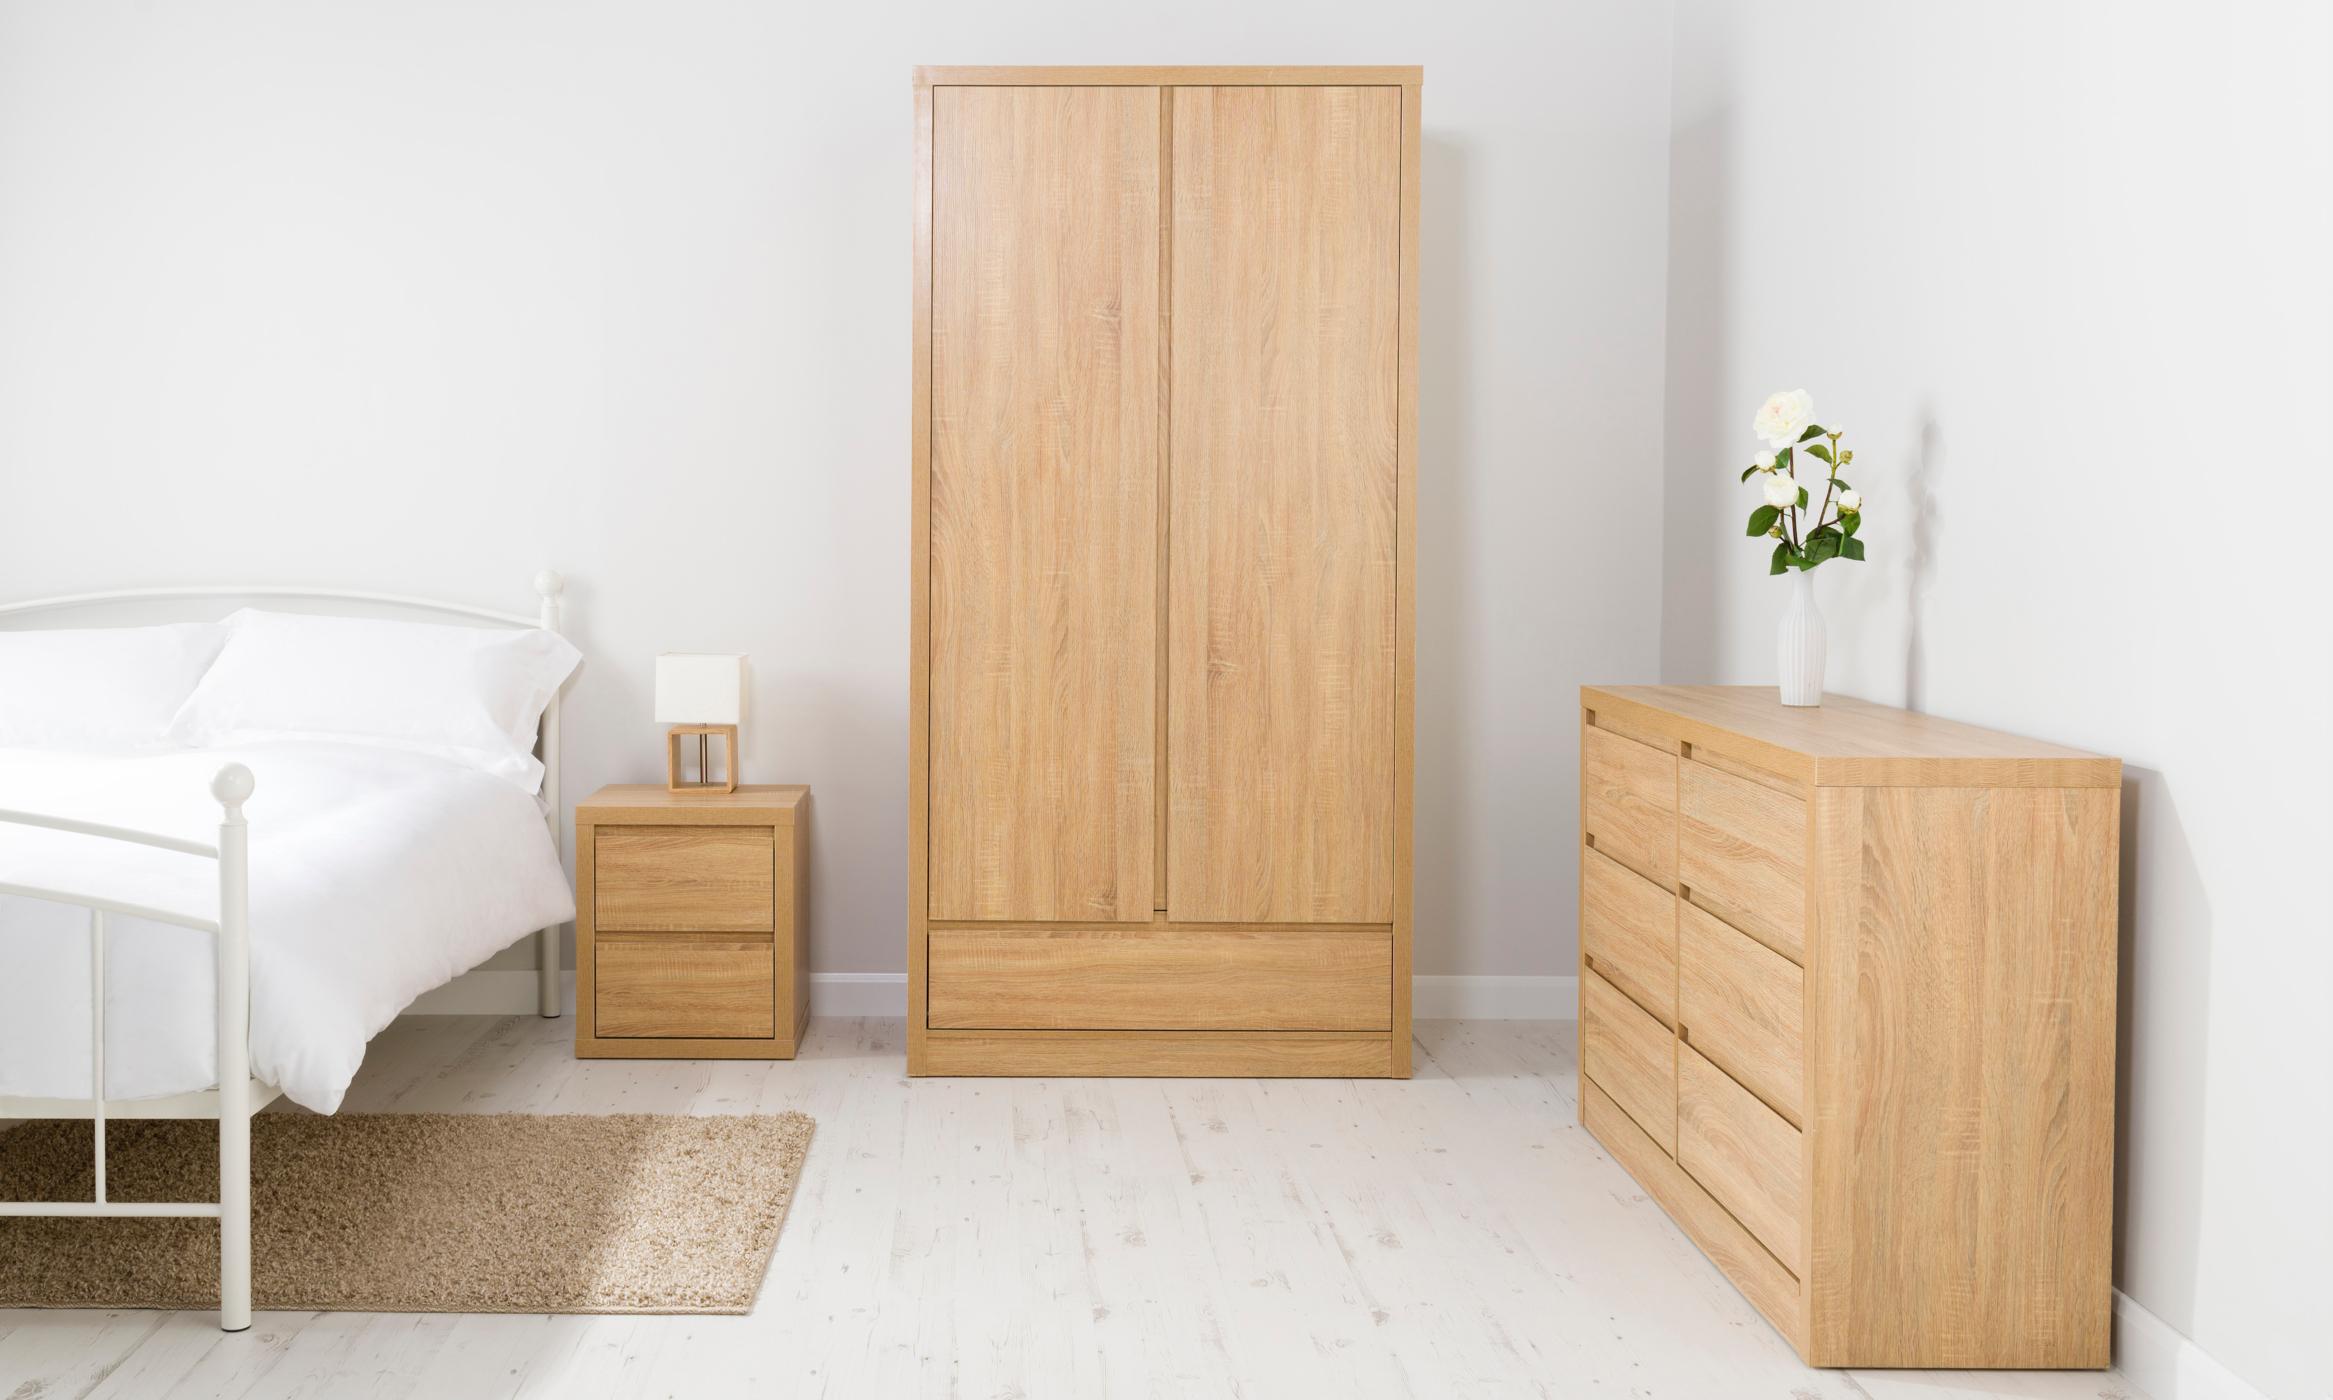 leighton bedroom furniture range - oak effect   view all   george at